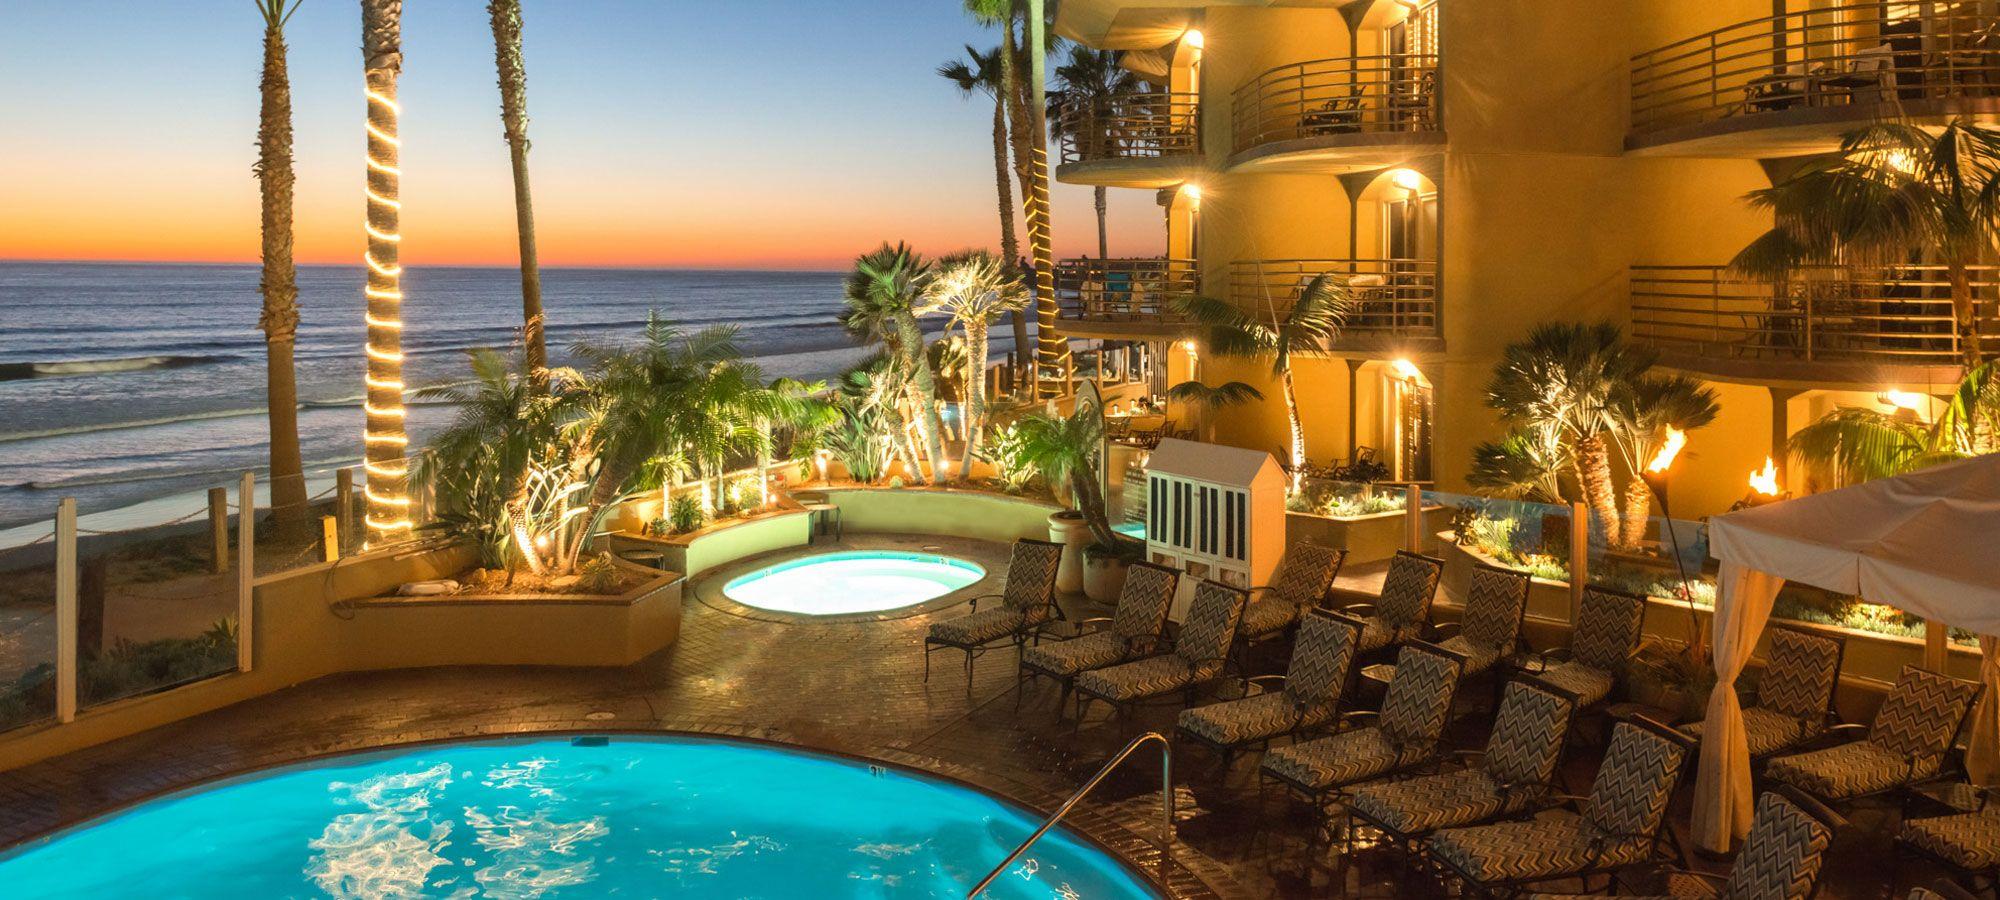 Beachfront San Go Hotel Pacific